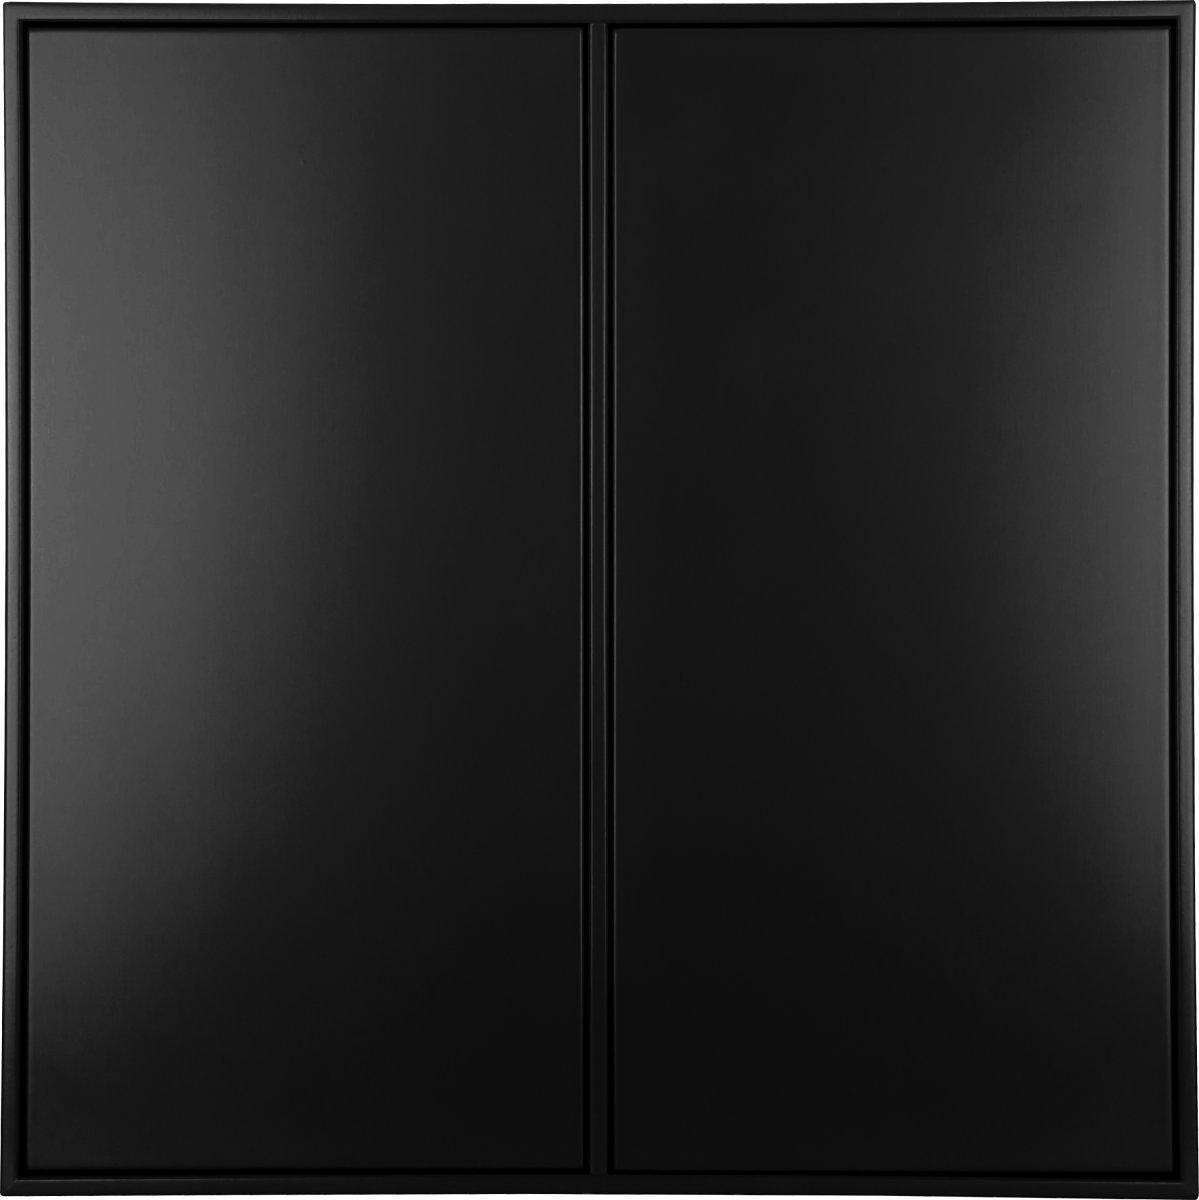 HAVANA skab m/4 rum, 2 låger, Black D.34 inkl. oph